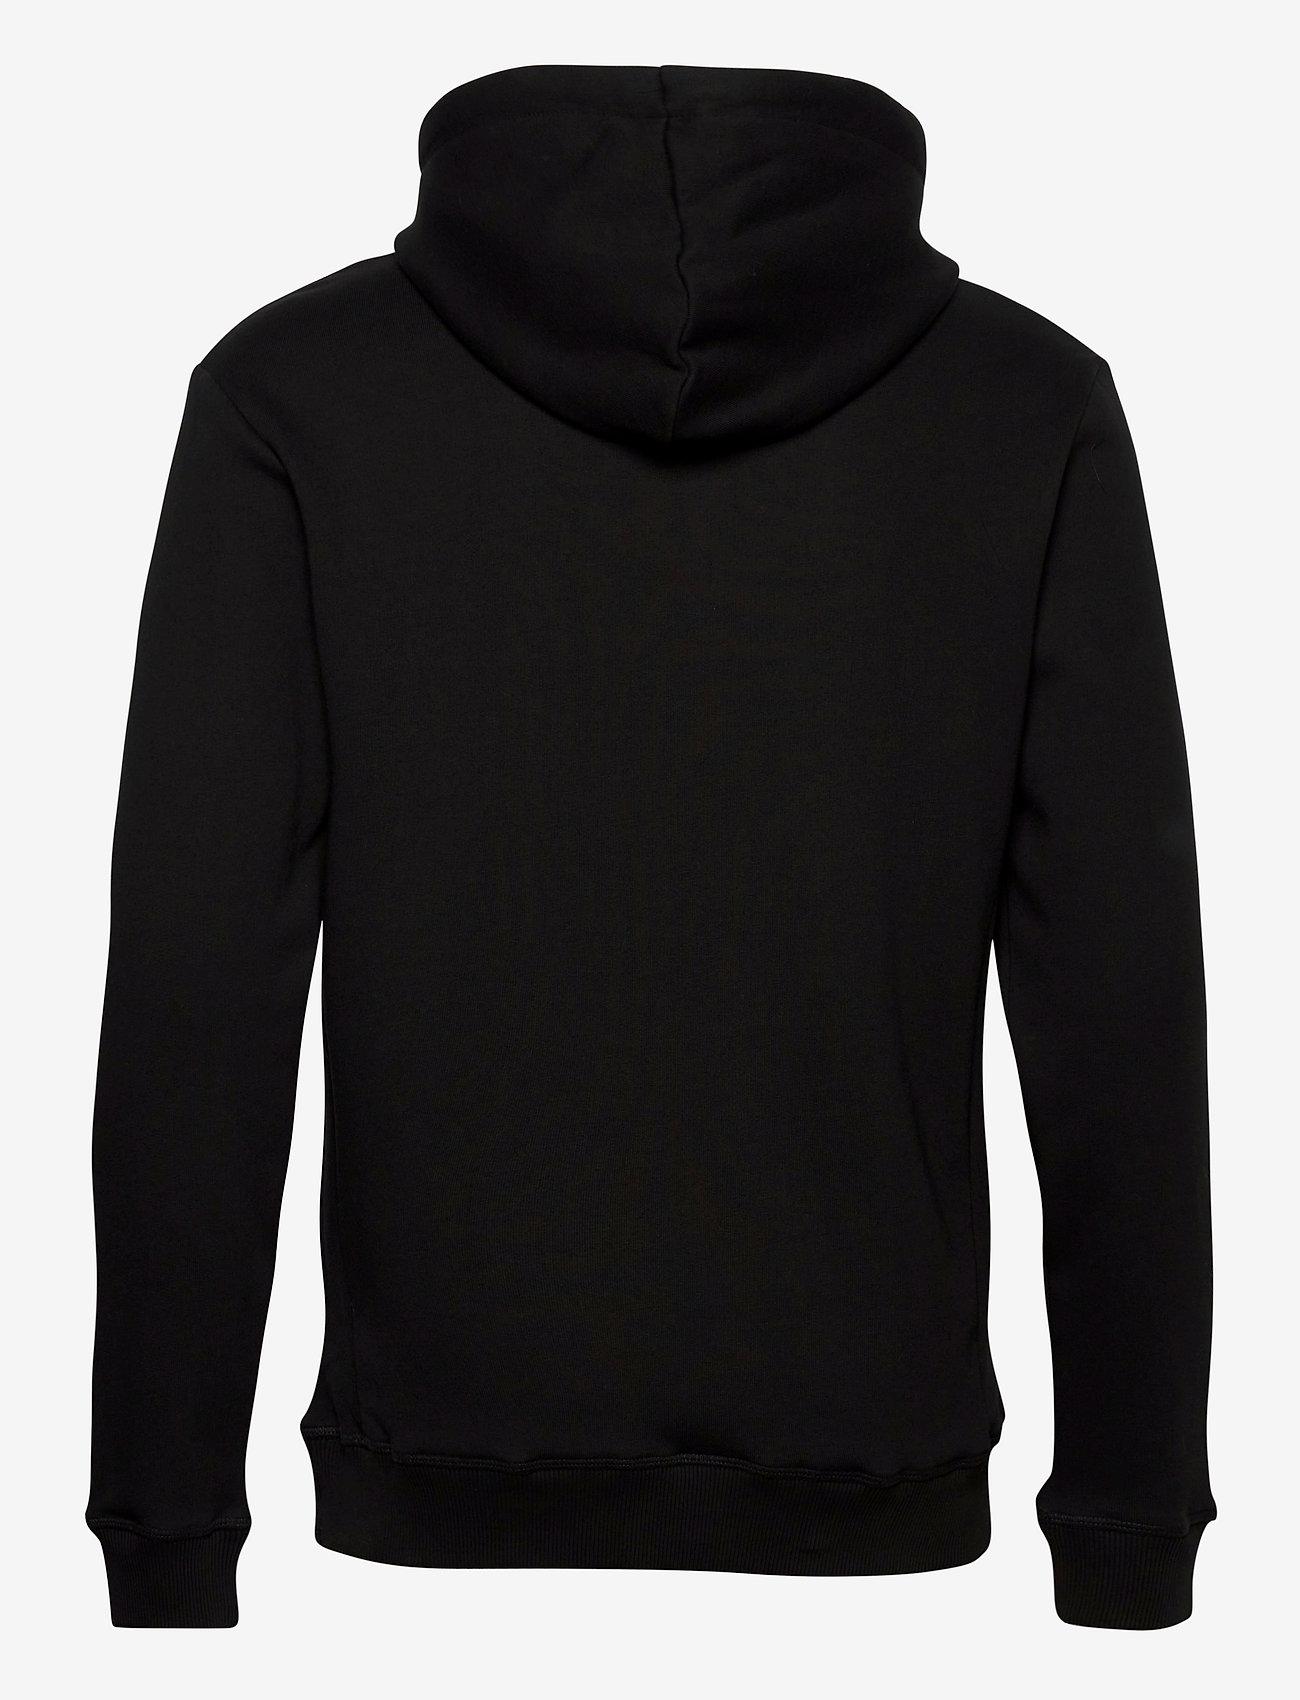 Les Deux Boozt Piece Hoodie - Sweatshirts BLACK/ORANGE-BLACK - Menn Klær